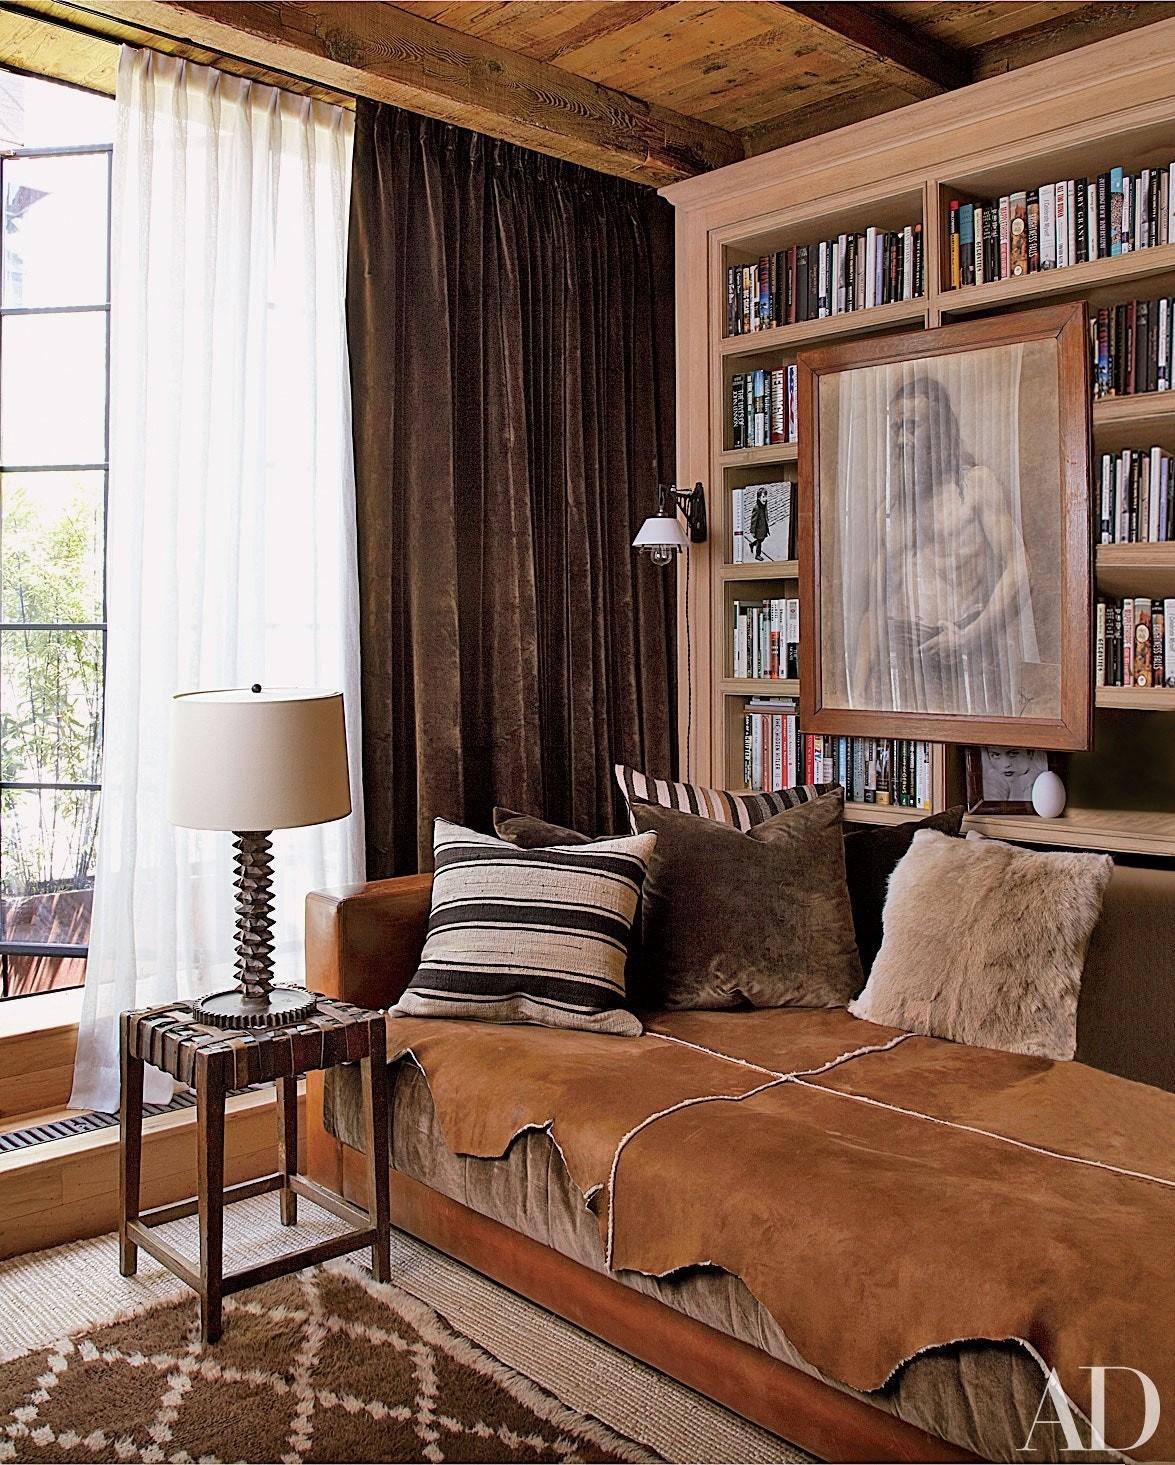 Southwestern living room furniture Lodge Style Southwestern Living Room Furniture Taqwaco Southwestern Living Room Furniture Ideas On Foter